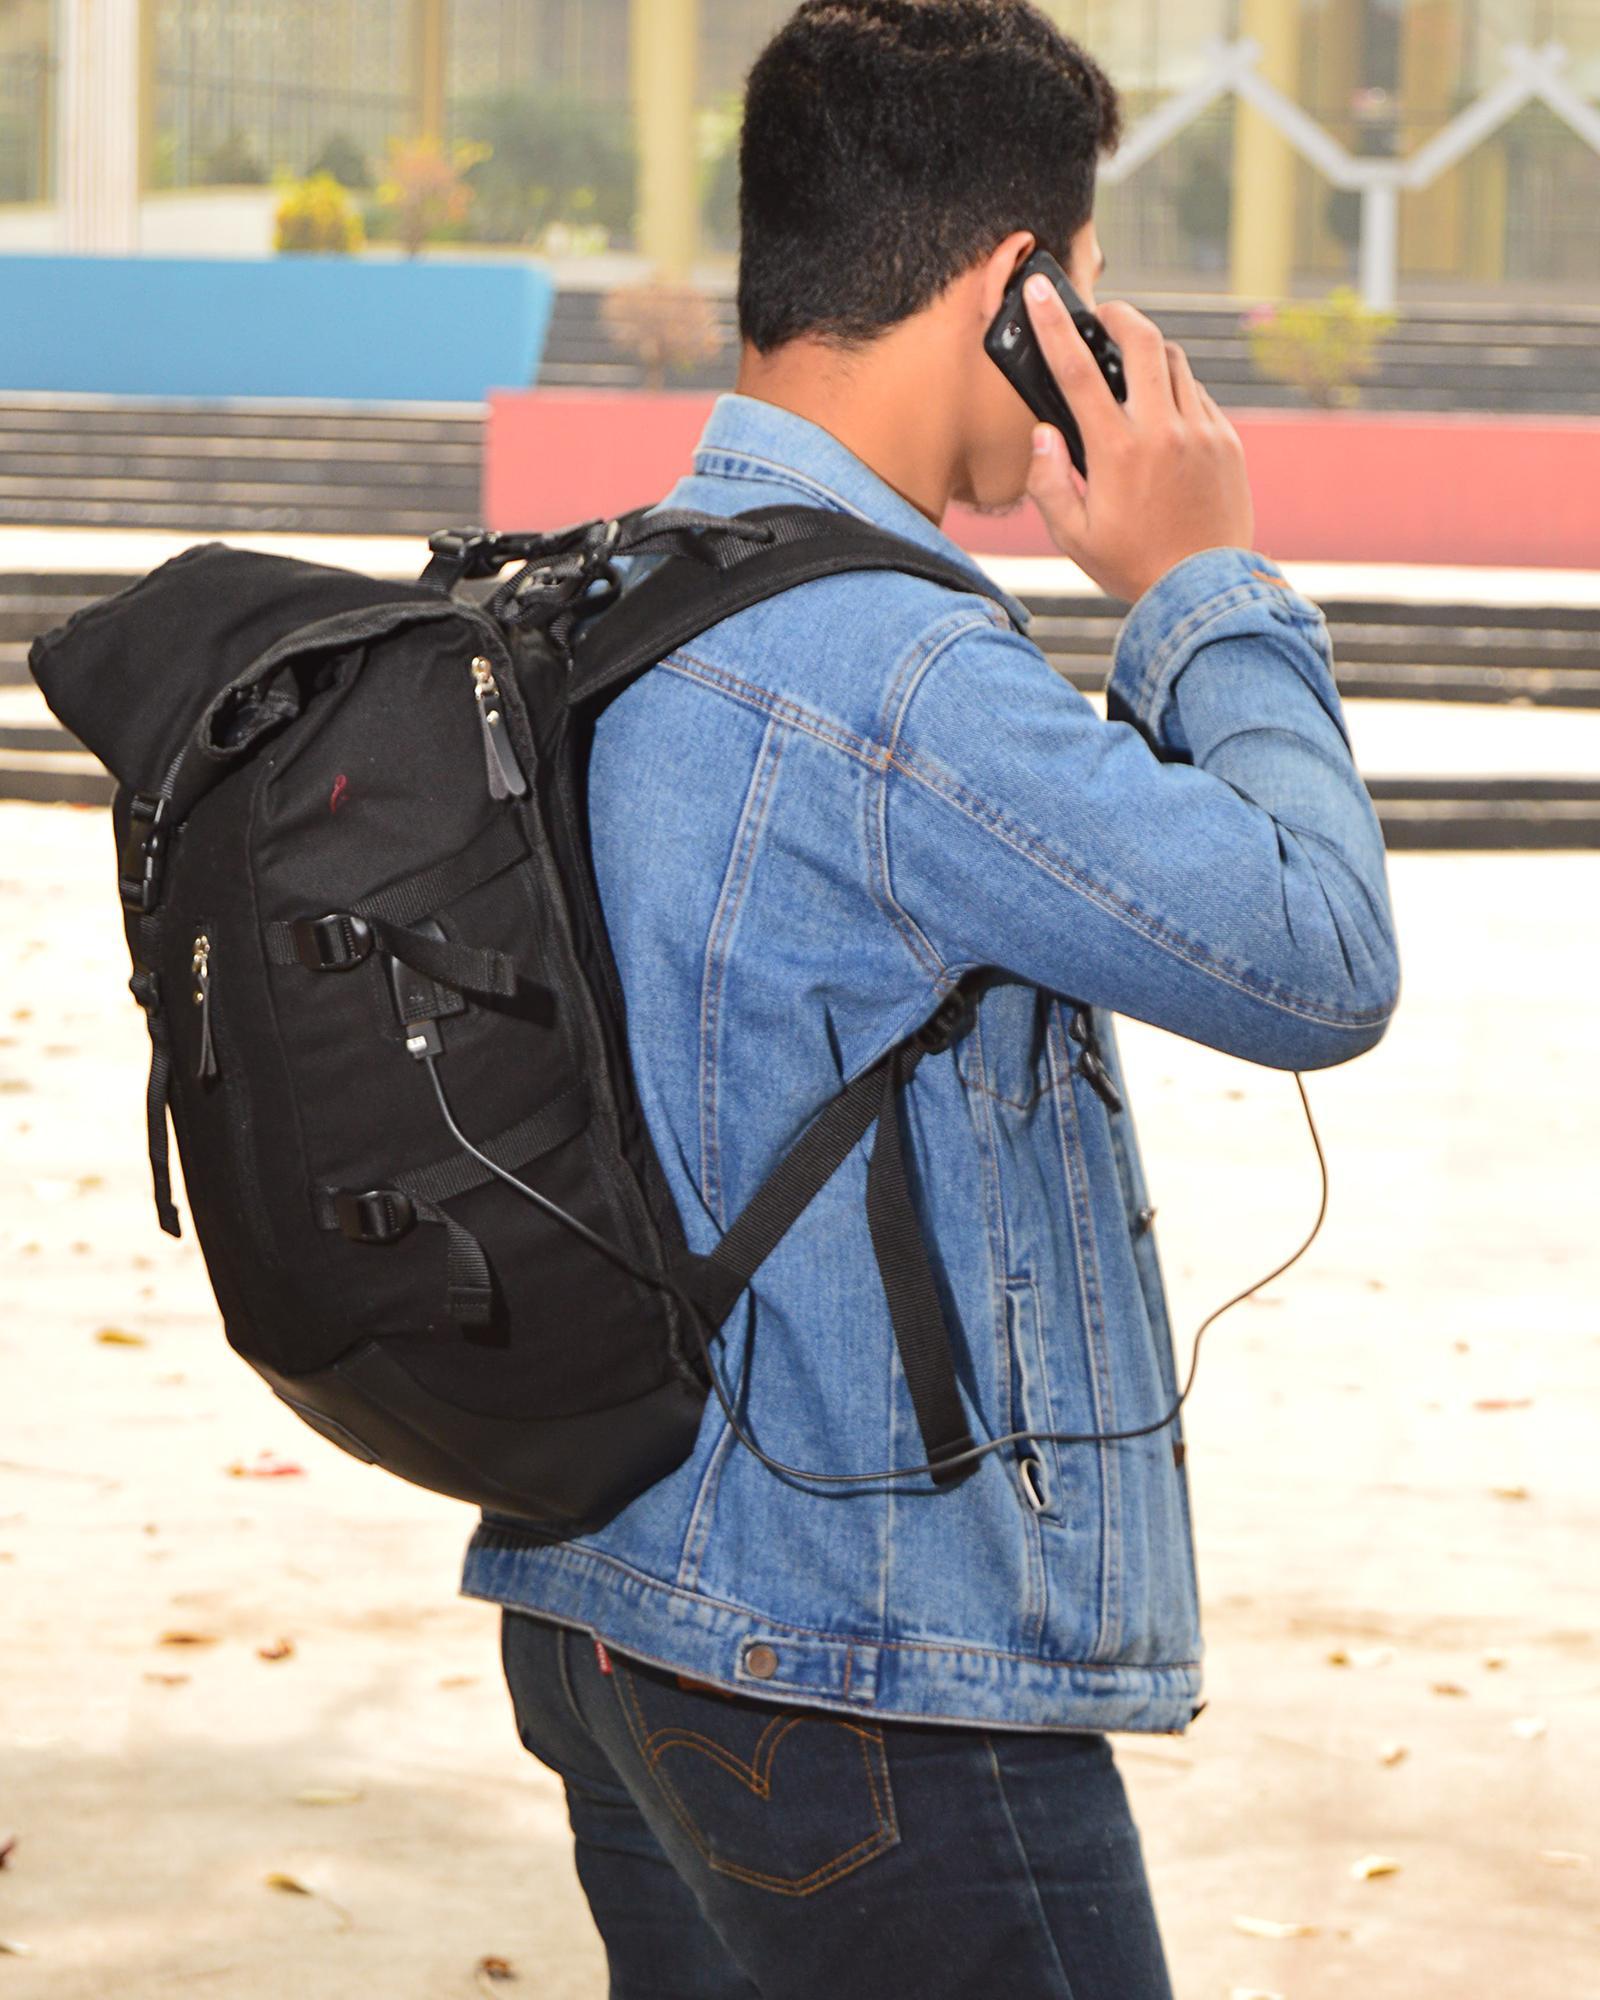 Smart Backpack Plus Tas Anti Maling Sling Bag Daftar Harga Uneed Capsule Ransel Ub104 Black Roll Top Usb Dan Earphone Port Korean Style